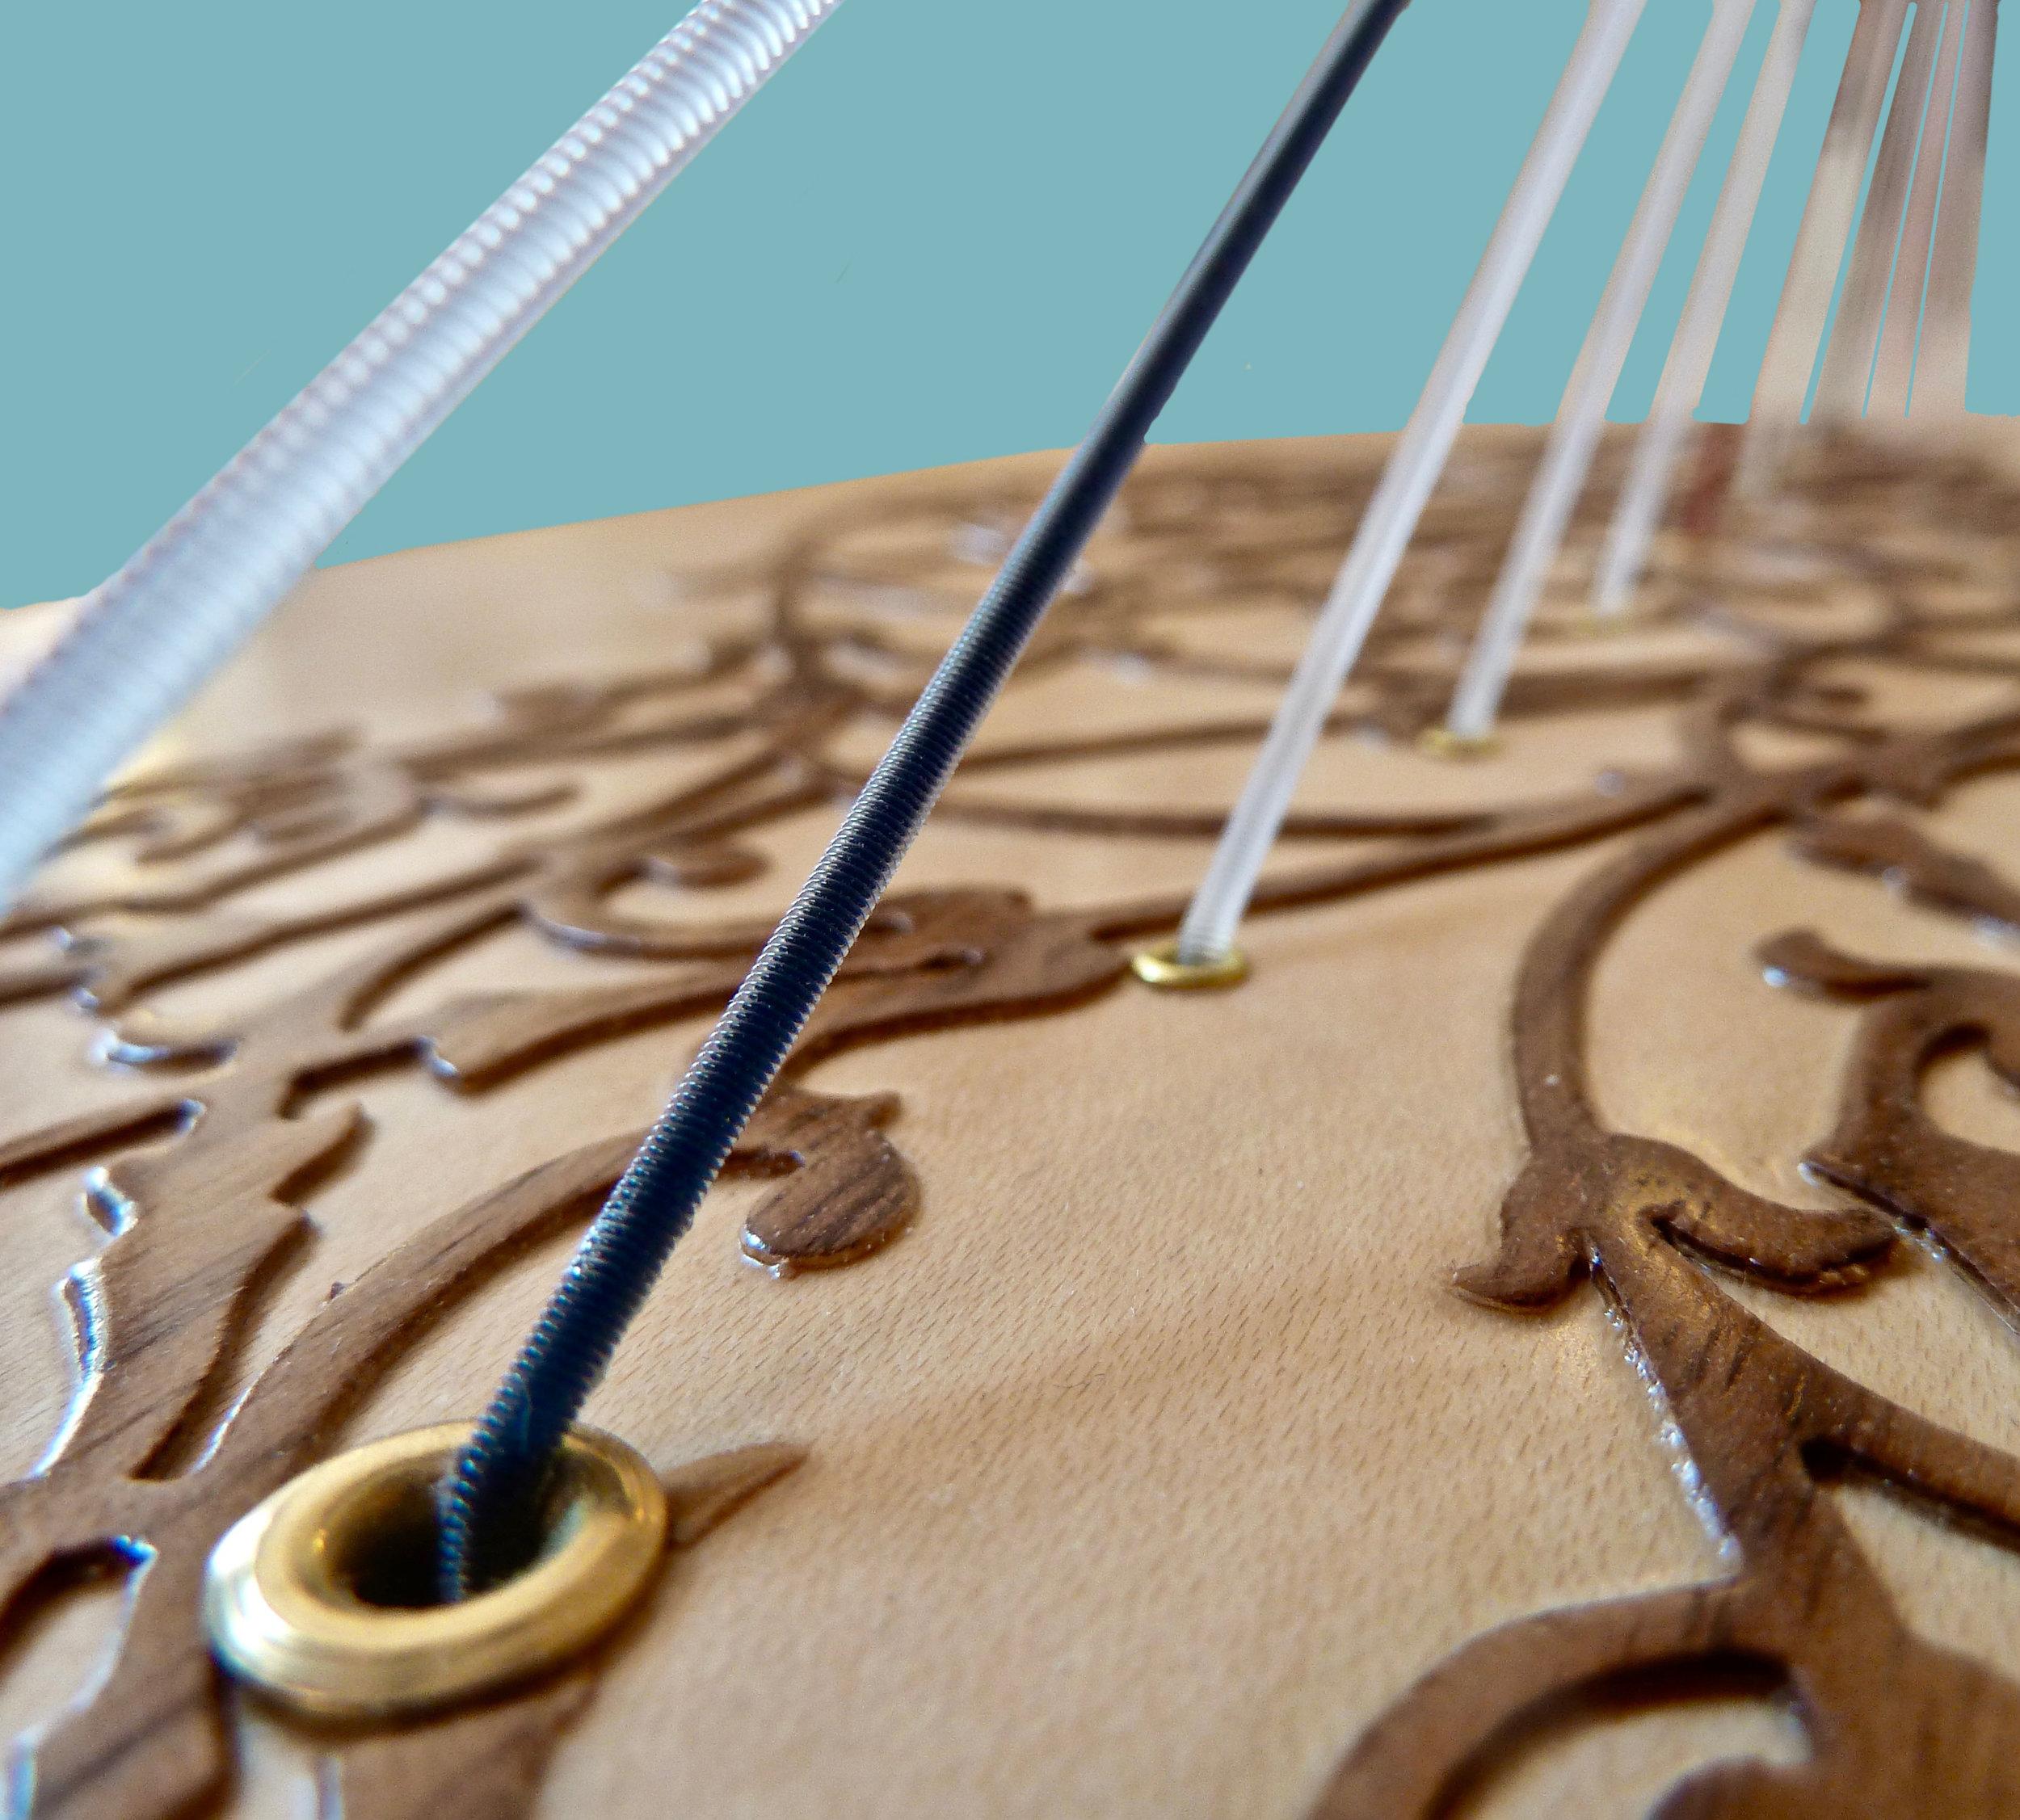 A Rees poplar soundboard with a maple veneer and walnut ornamentation.